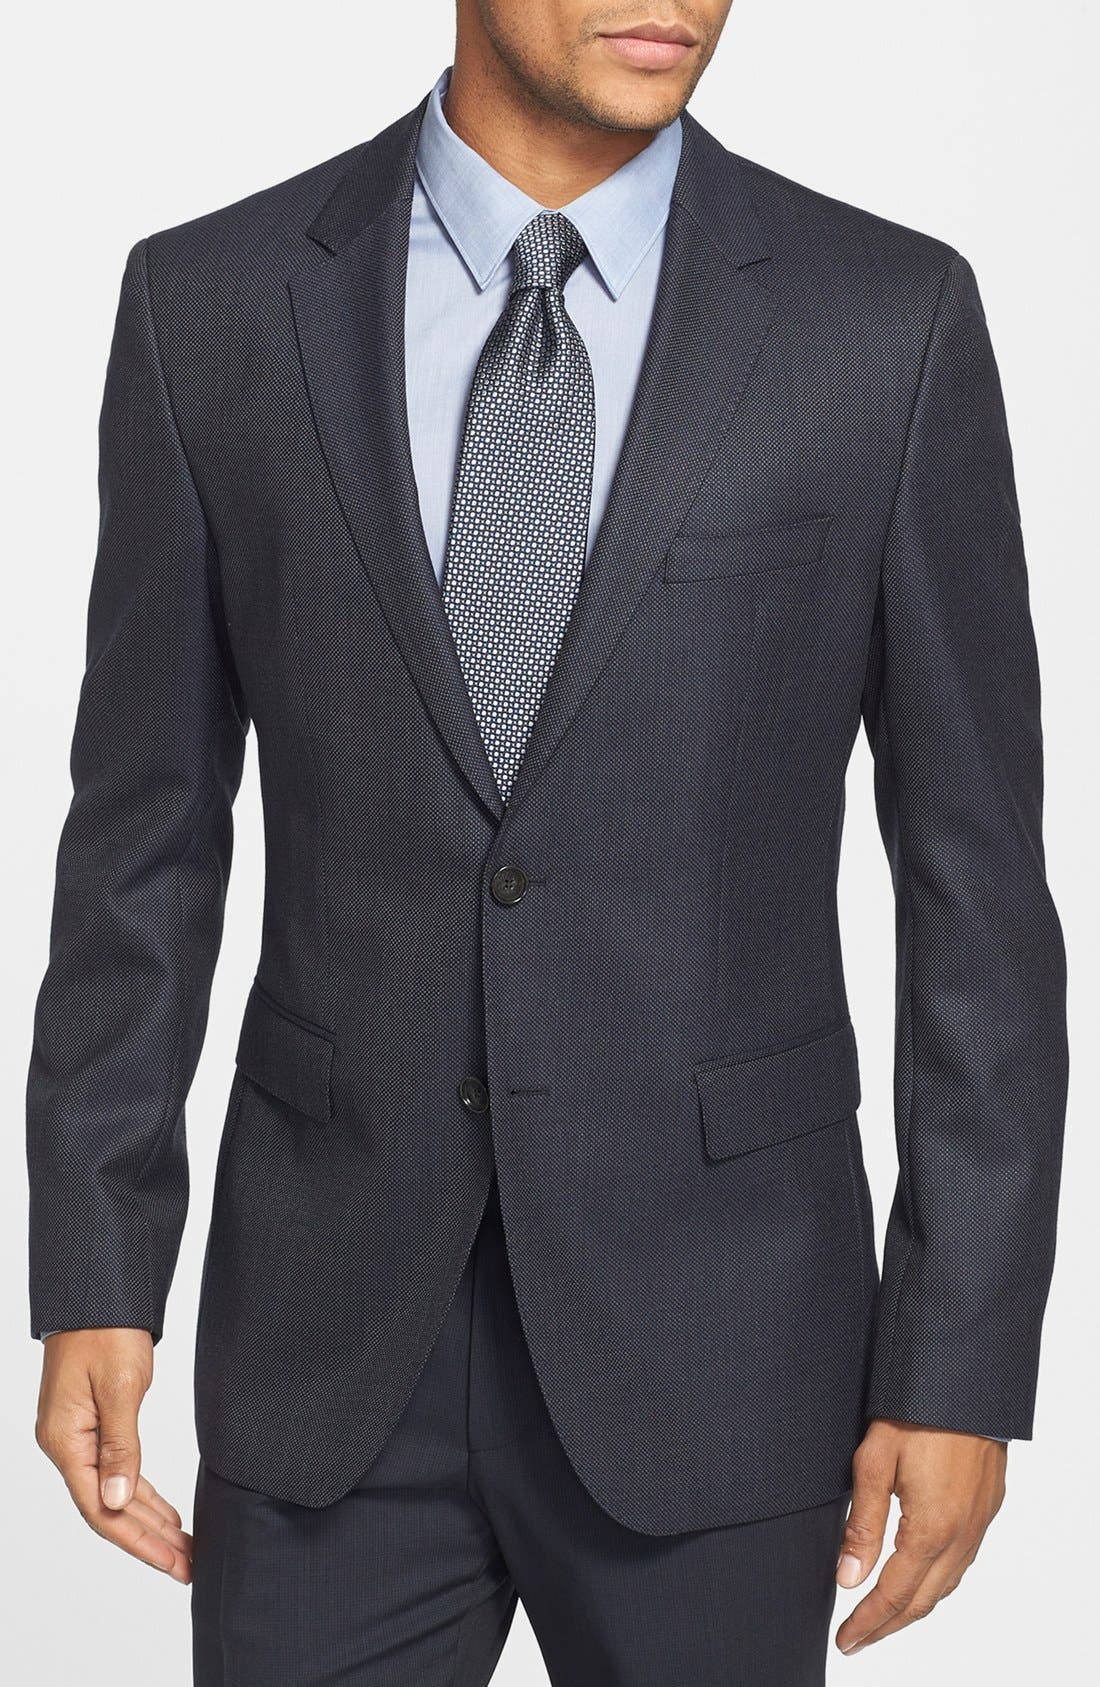 Alternate Image 1 Selected - BOSS HUGO BOSS 'James' Trim Fit Wool Sportcoat